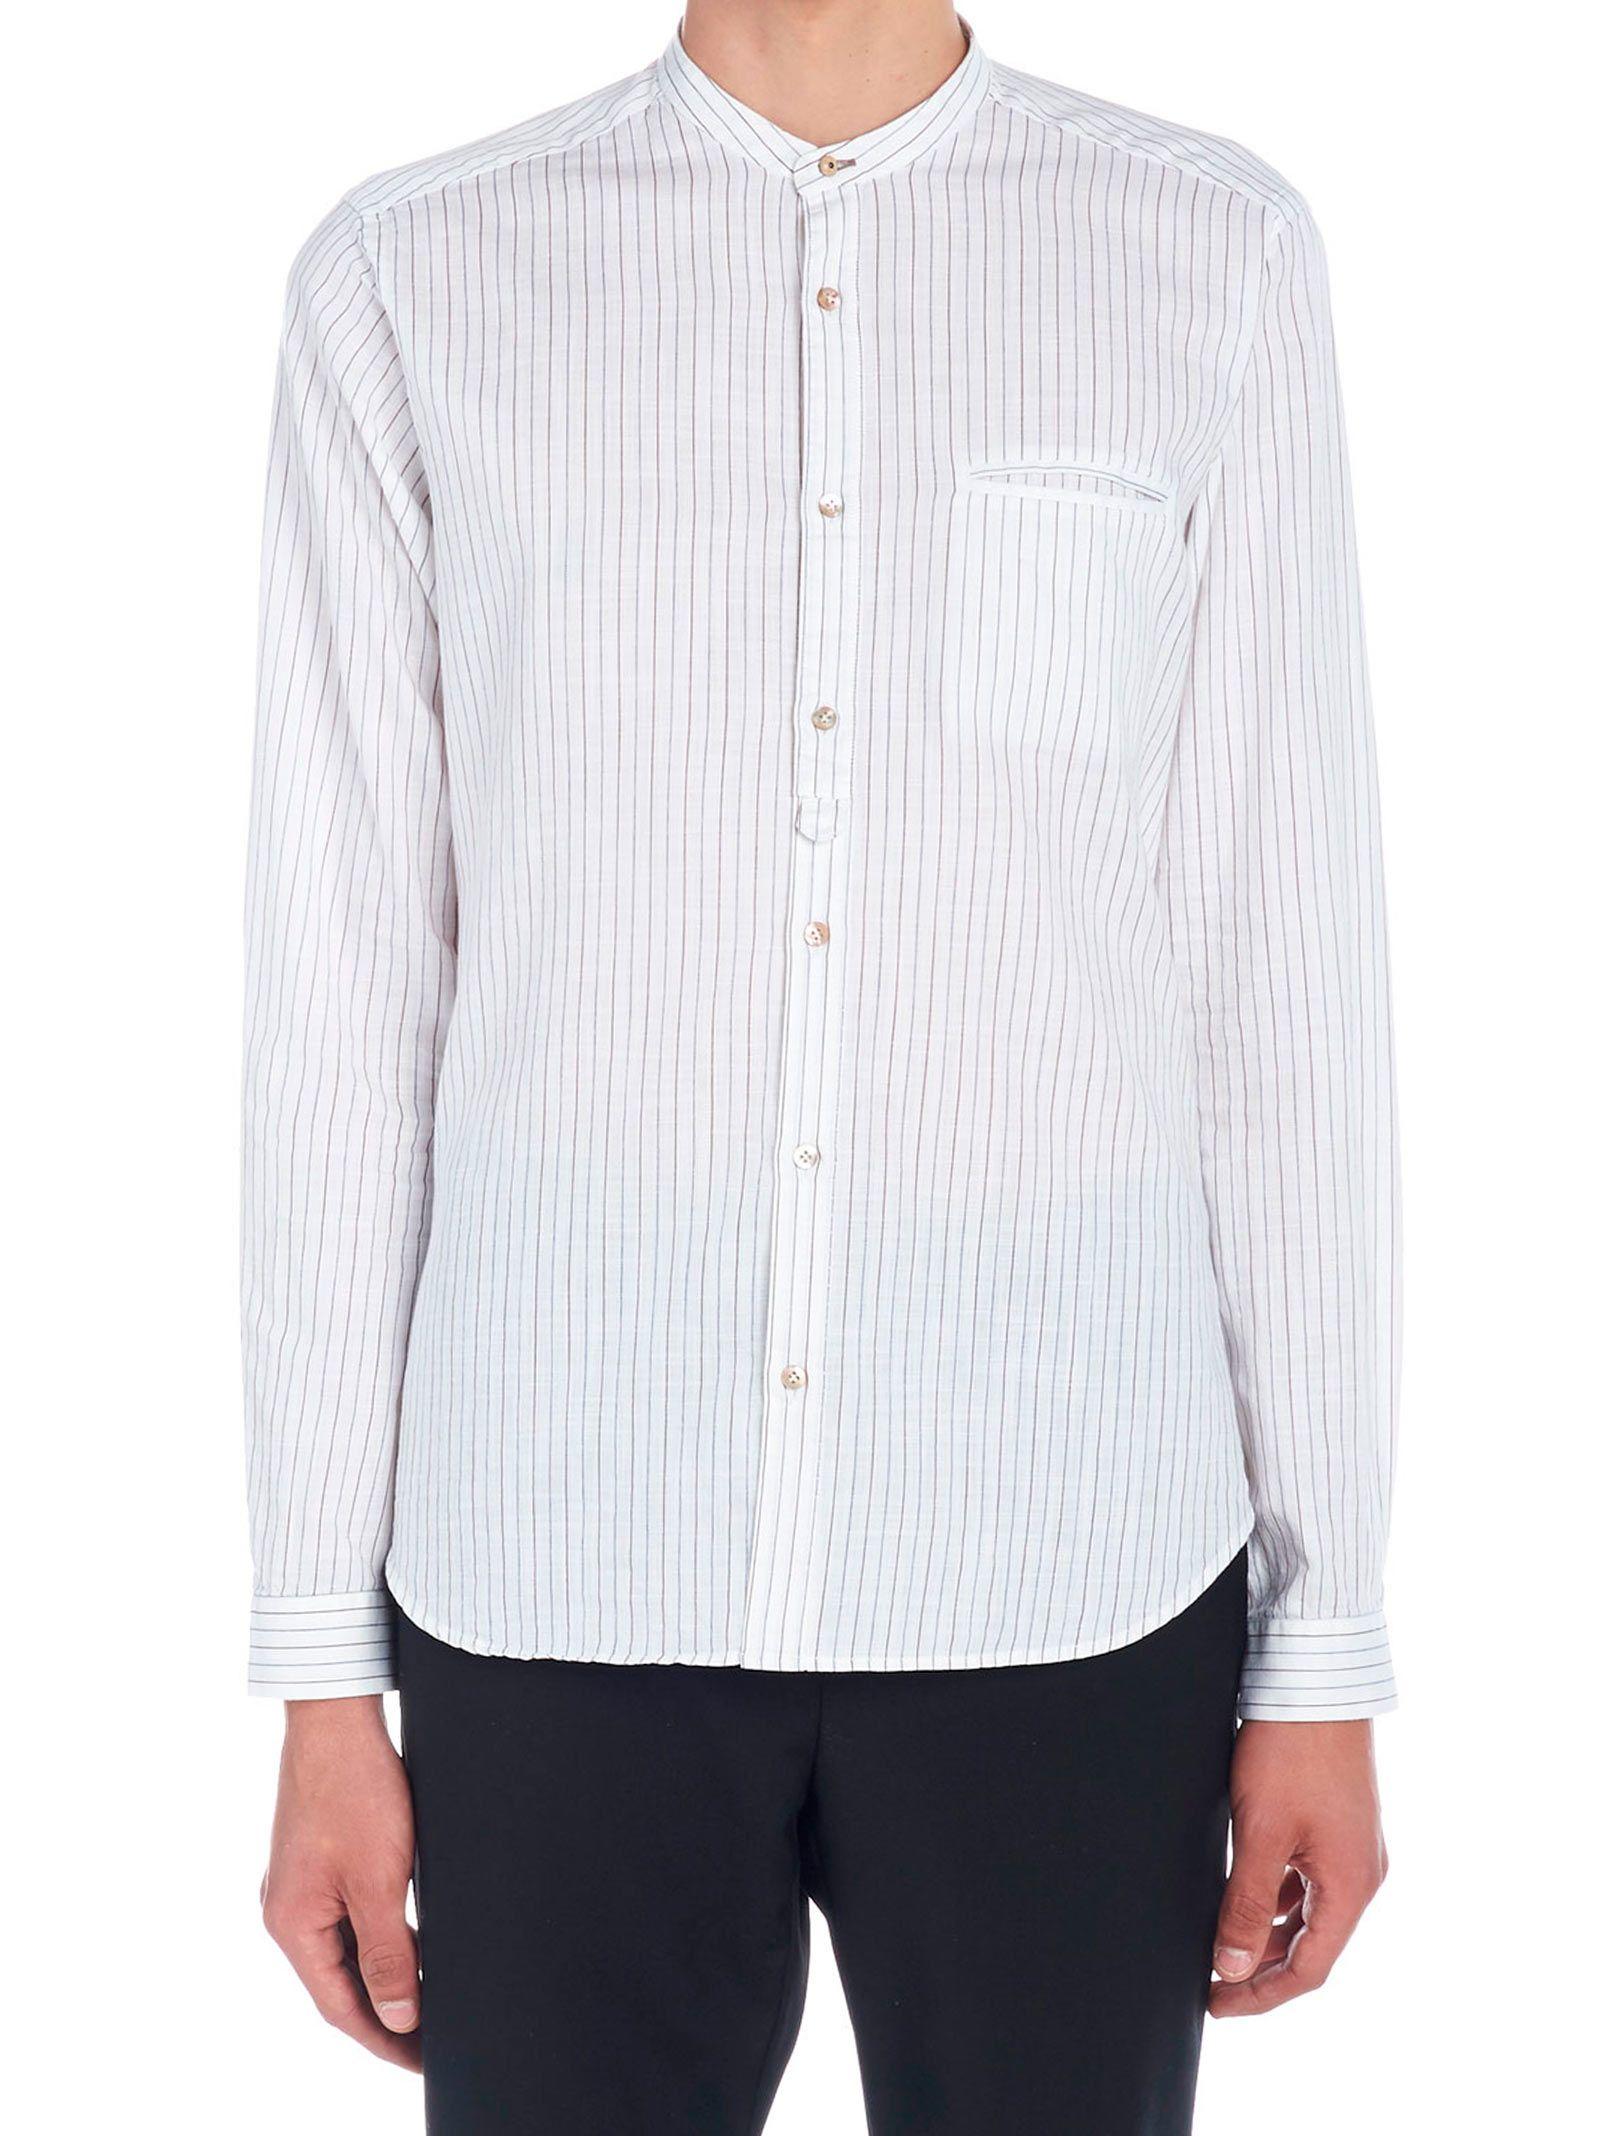 DNL Dnl Shirt in White